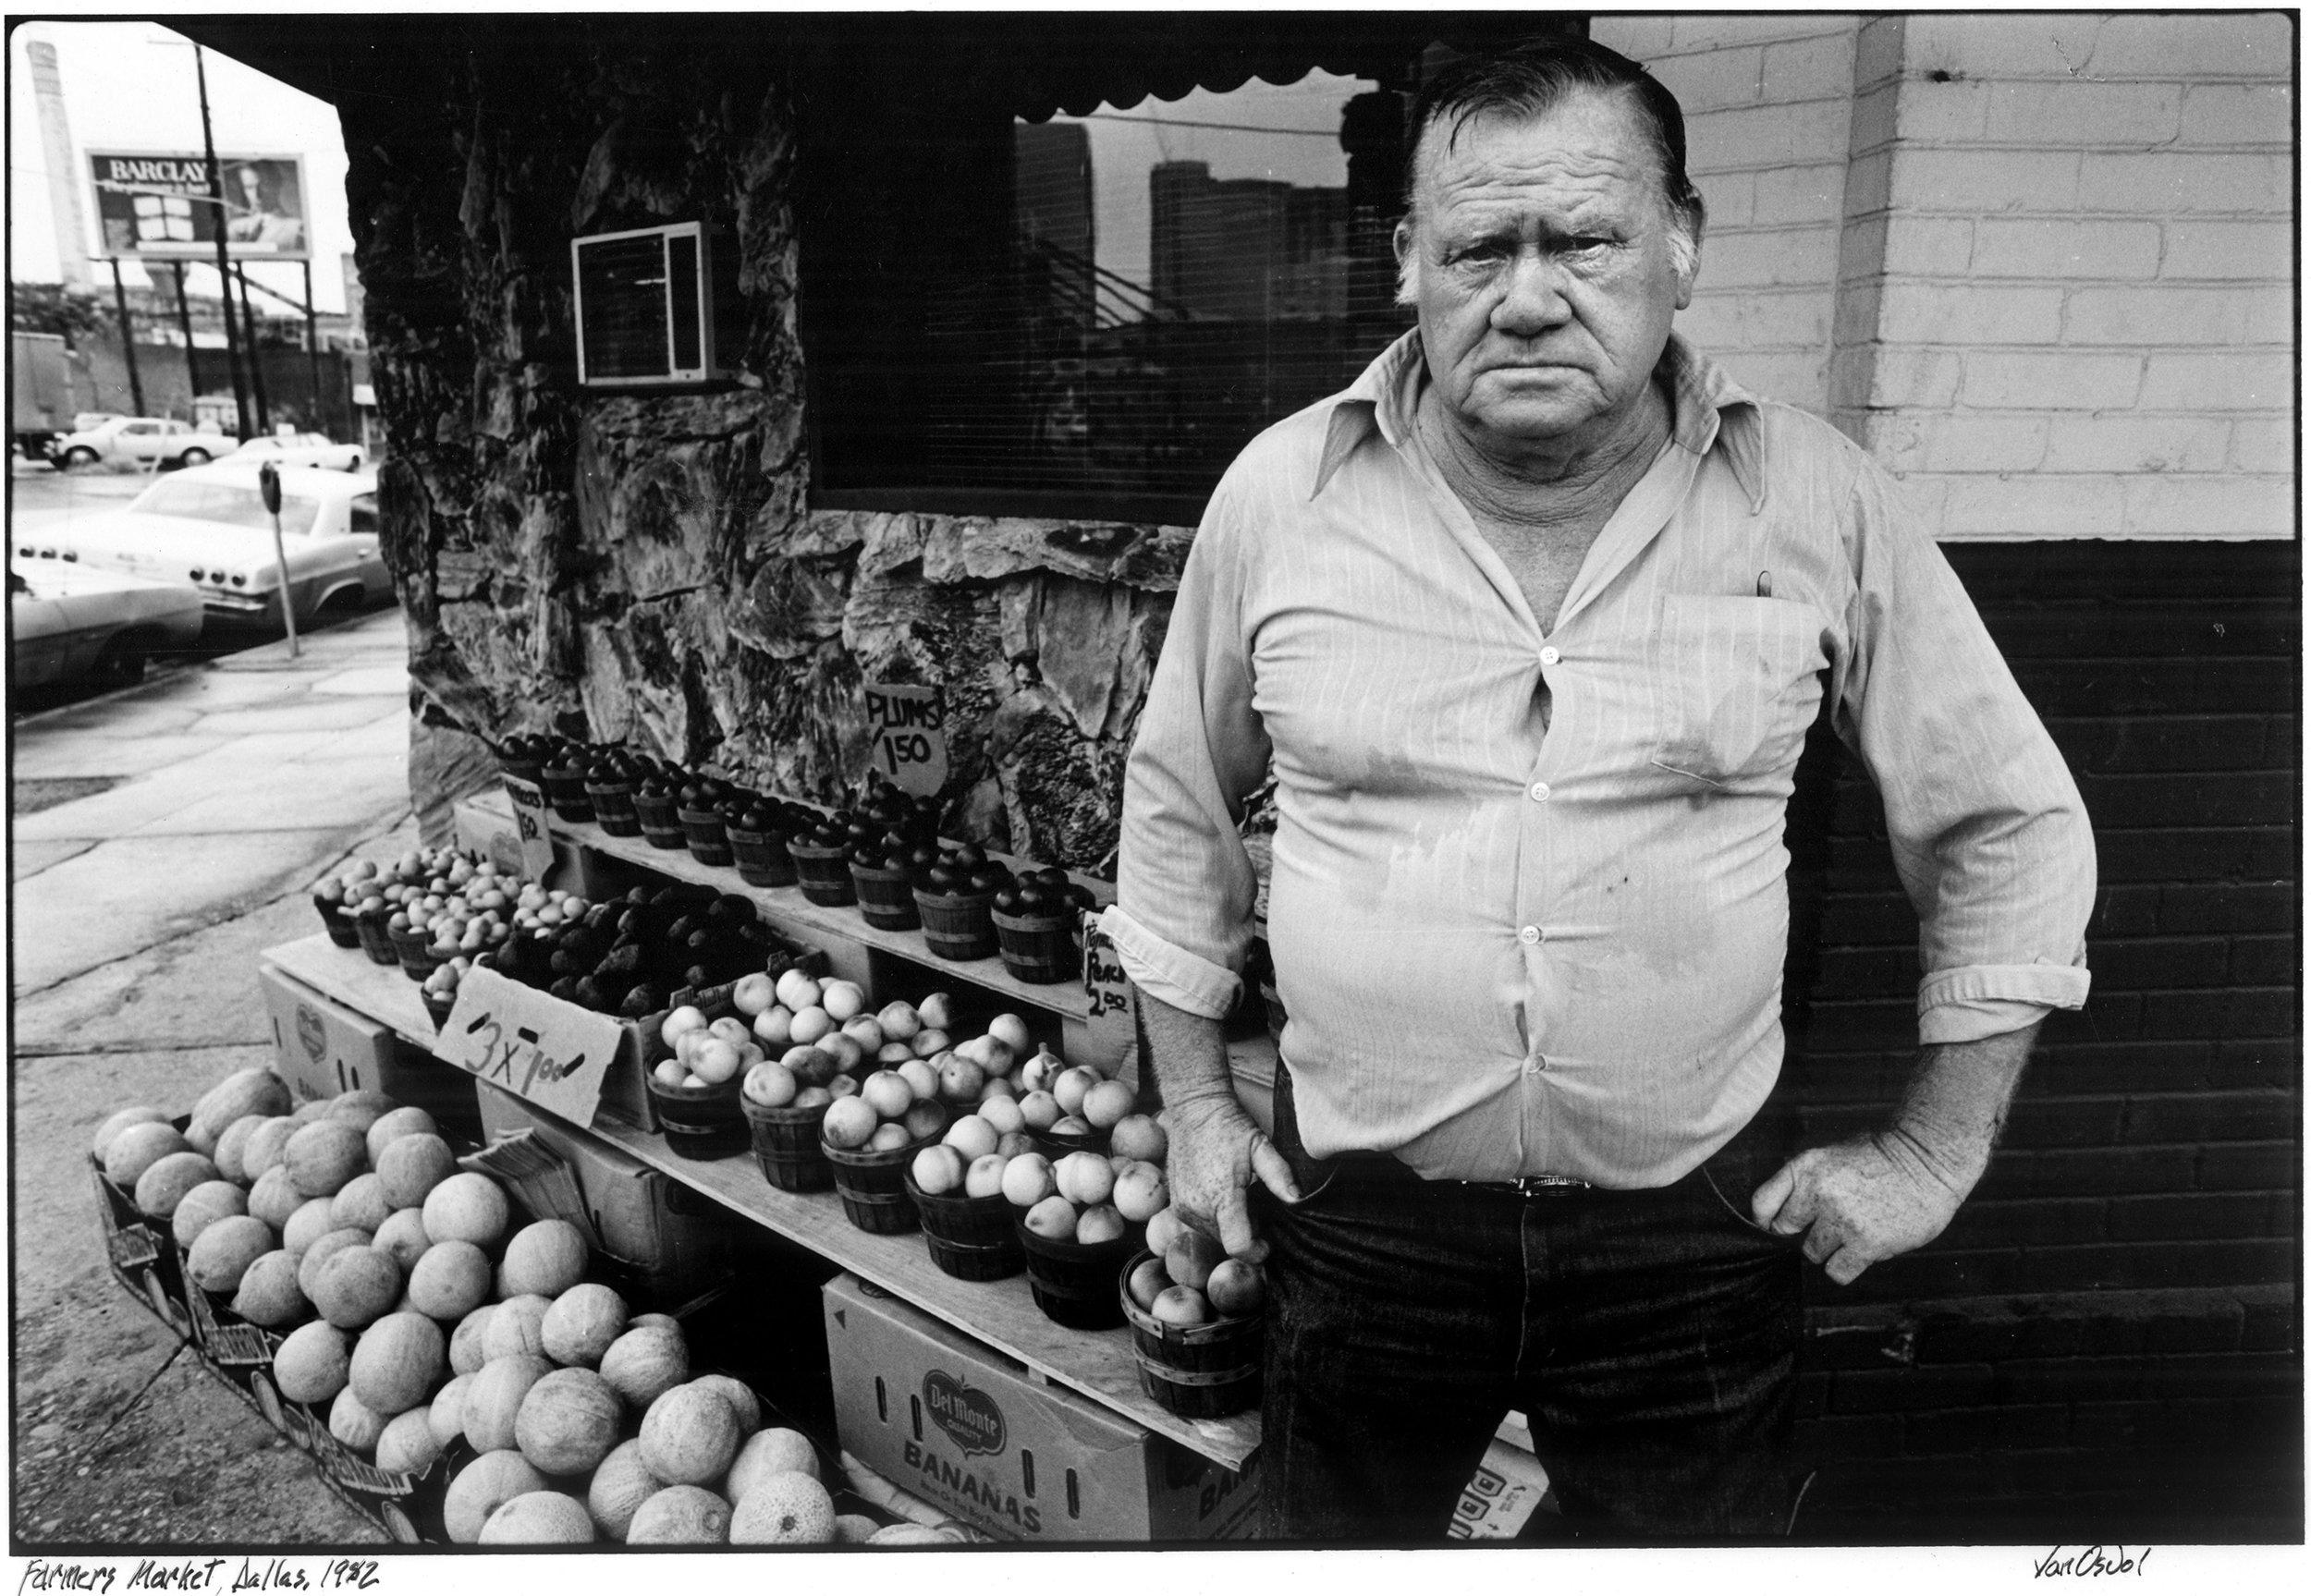 Peach Farmer at Market, Dallas, 1982